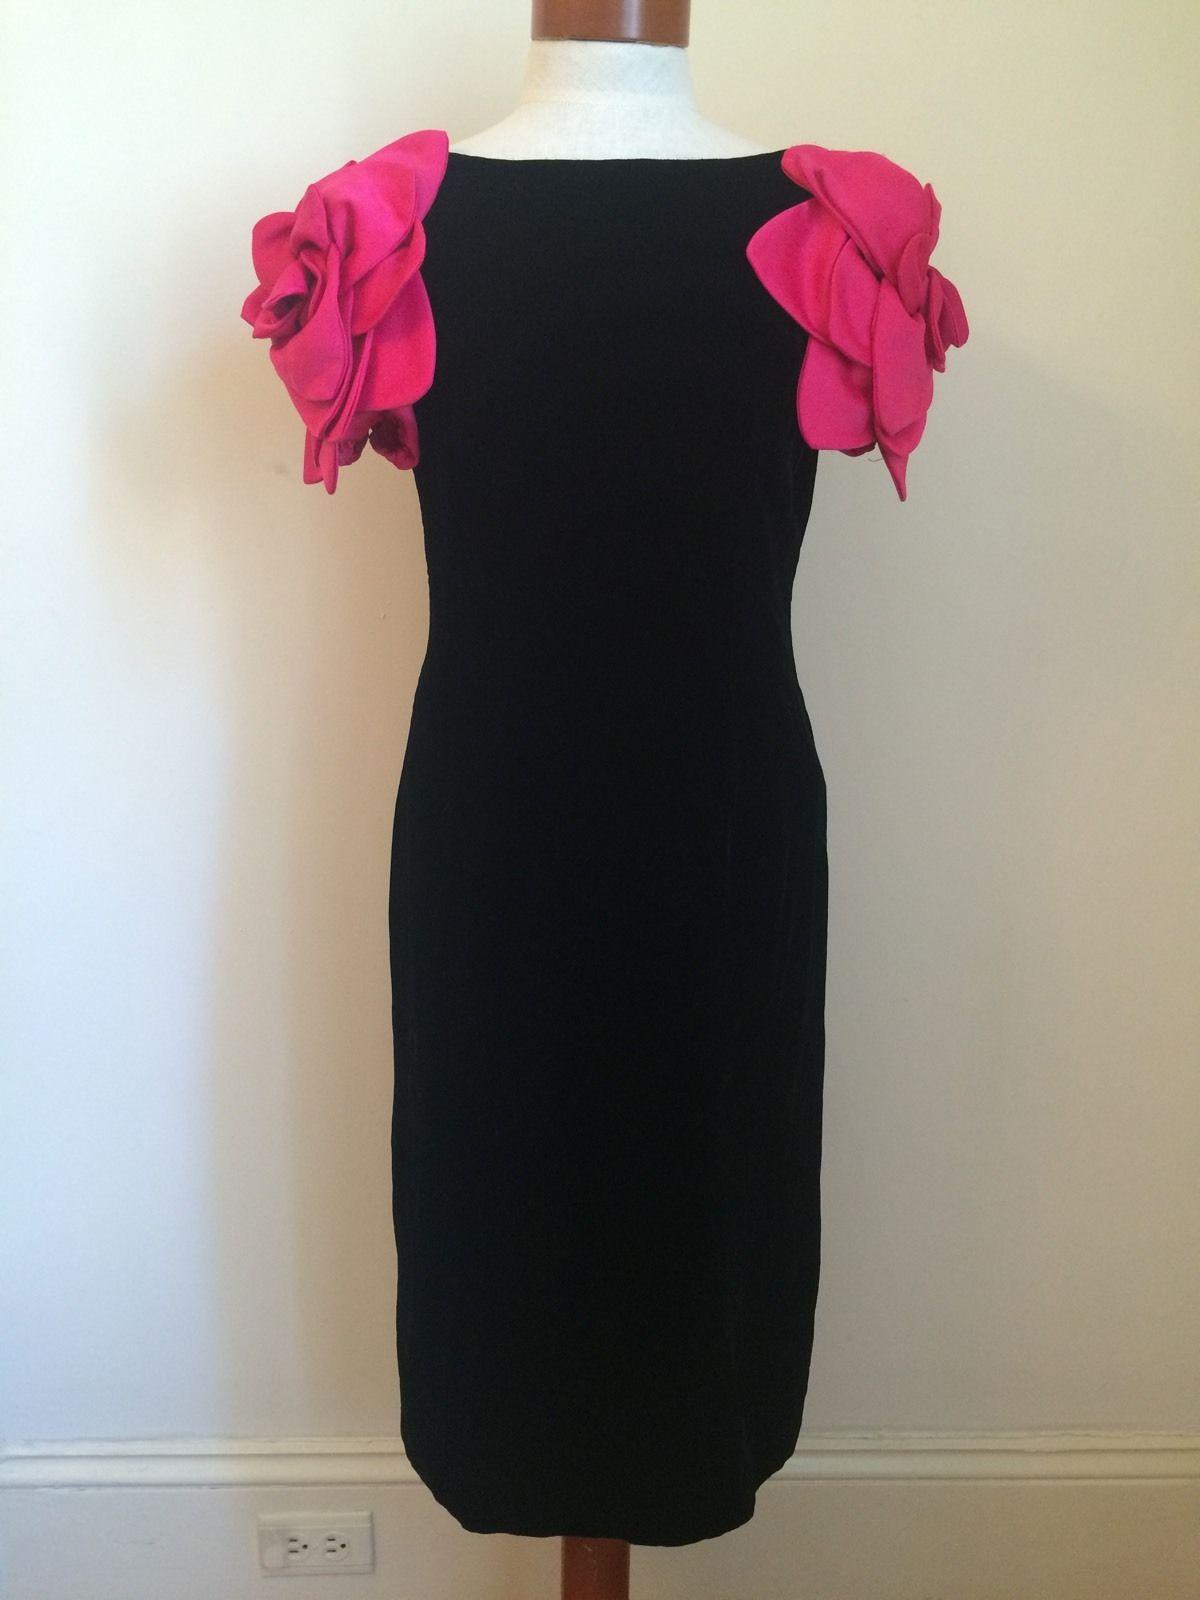 ebay-velvet-victor-costa-vintage-70s-80s-black-velvet-cocktail-dress-pink-roses-size-10